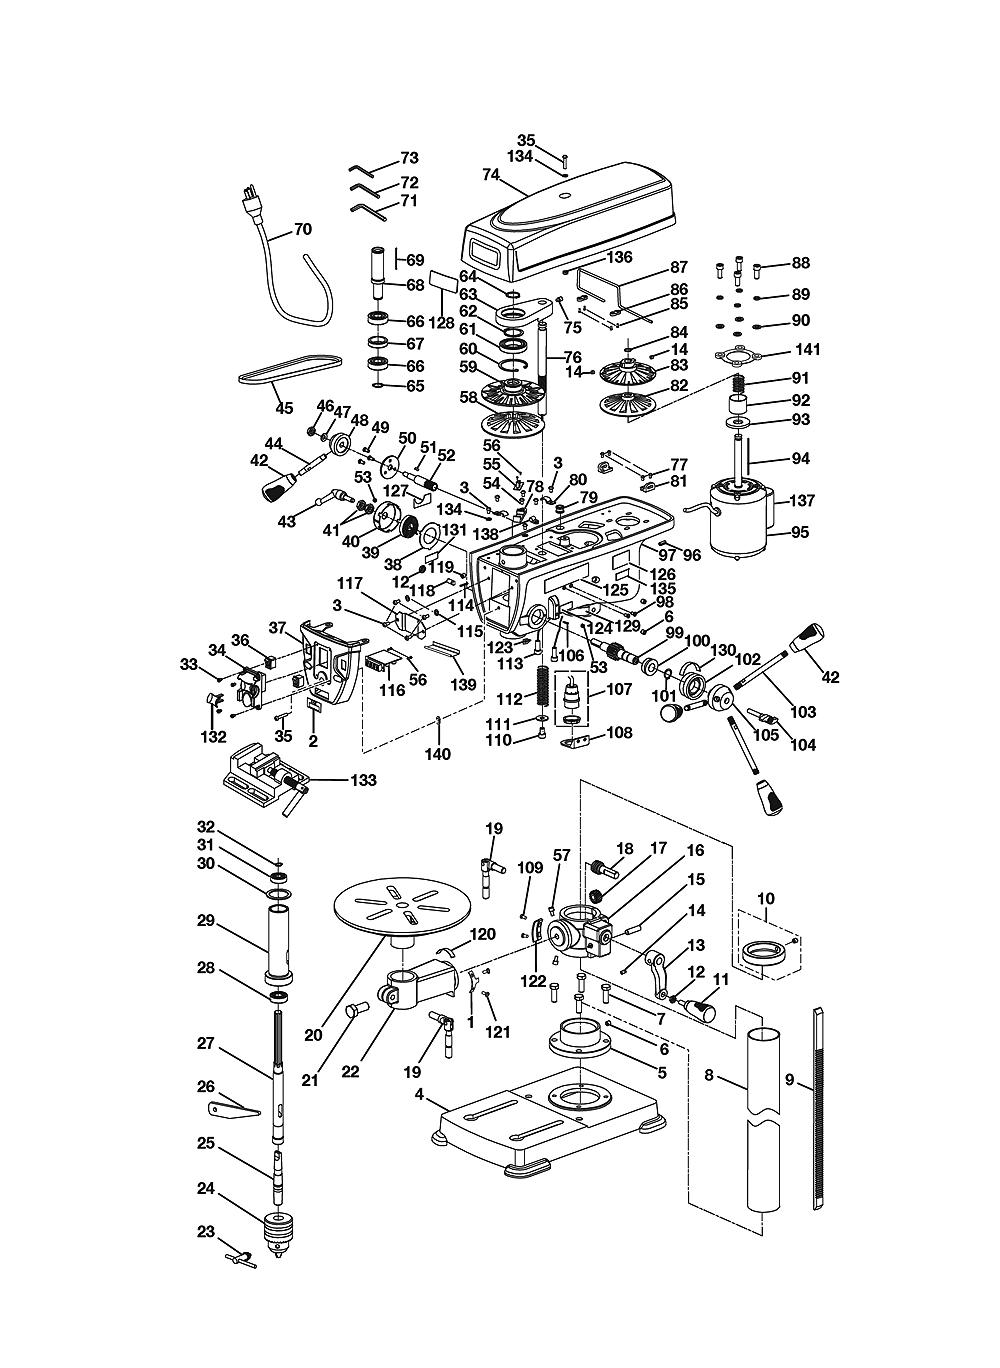 buy ryobi dp121l replacement tool parts